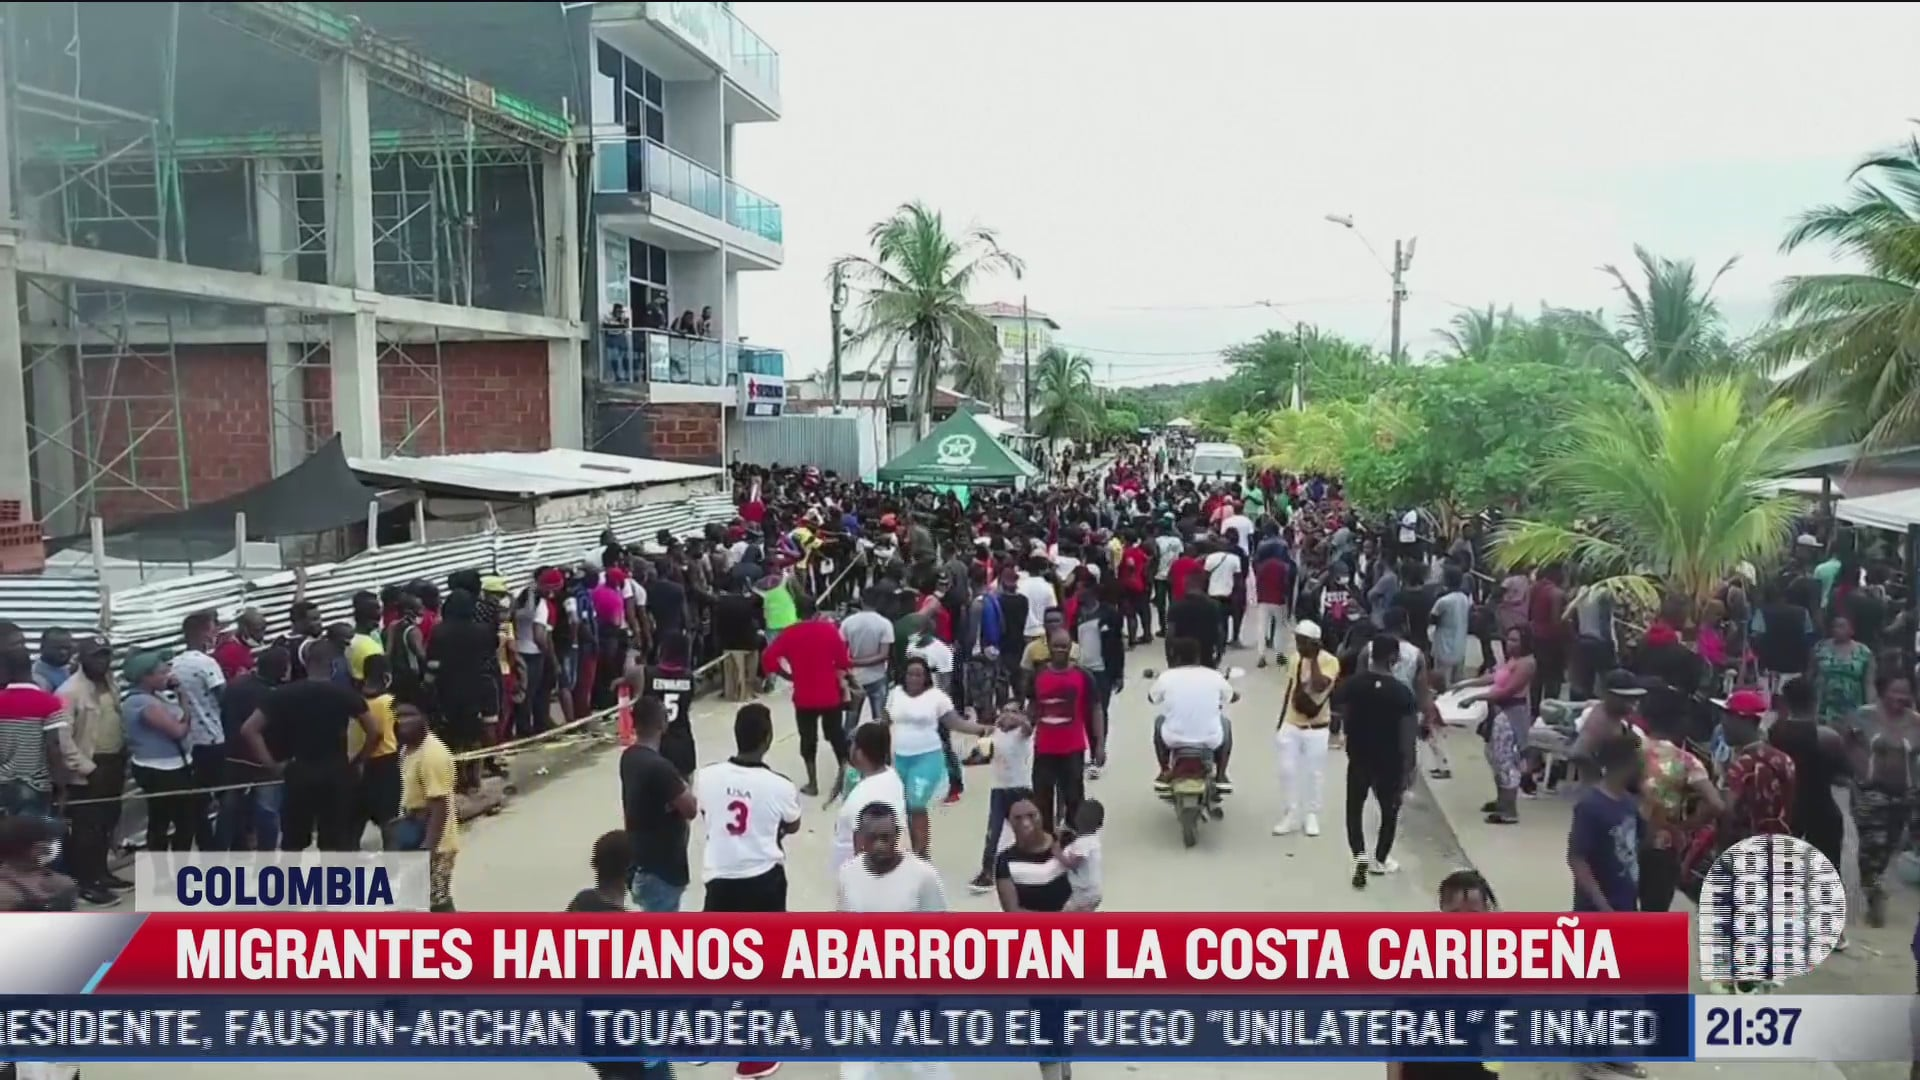 migrantes haitianos abarrotan costa caribena